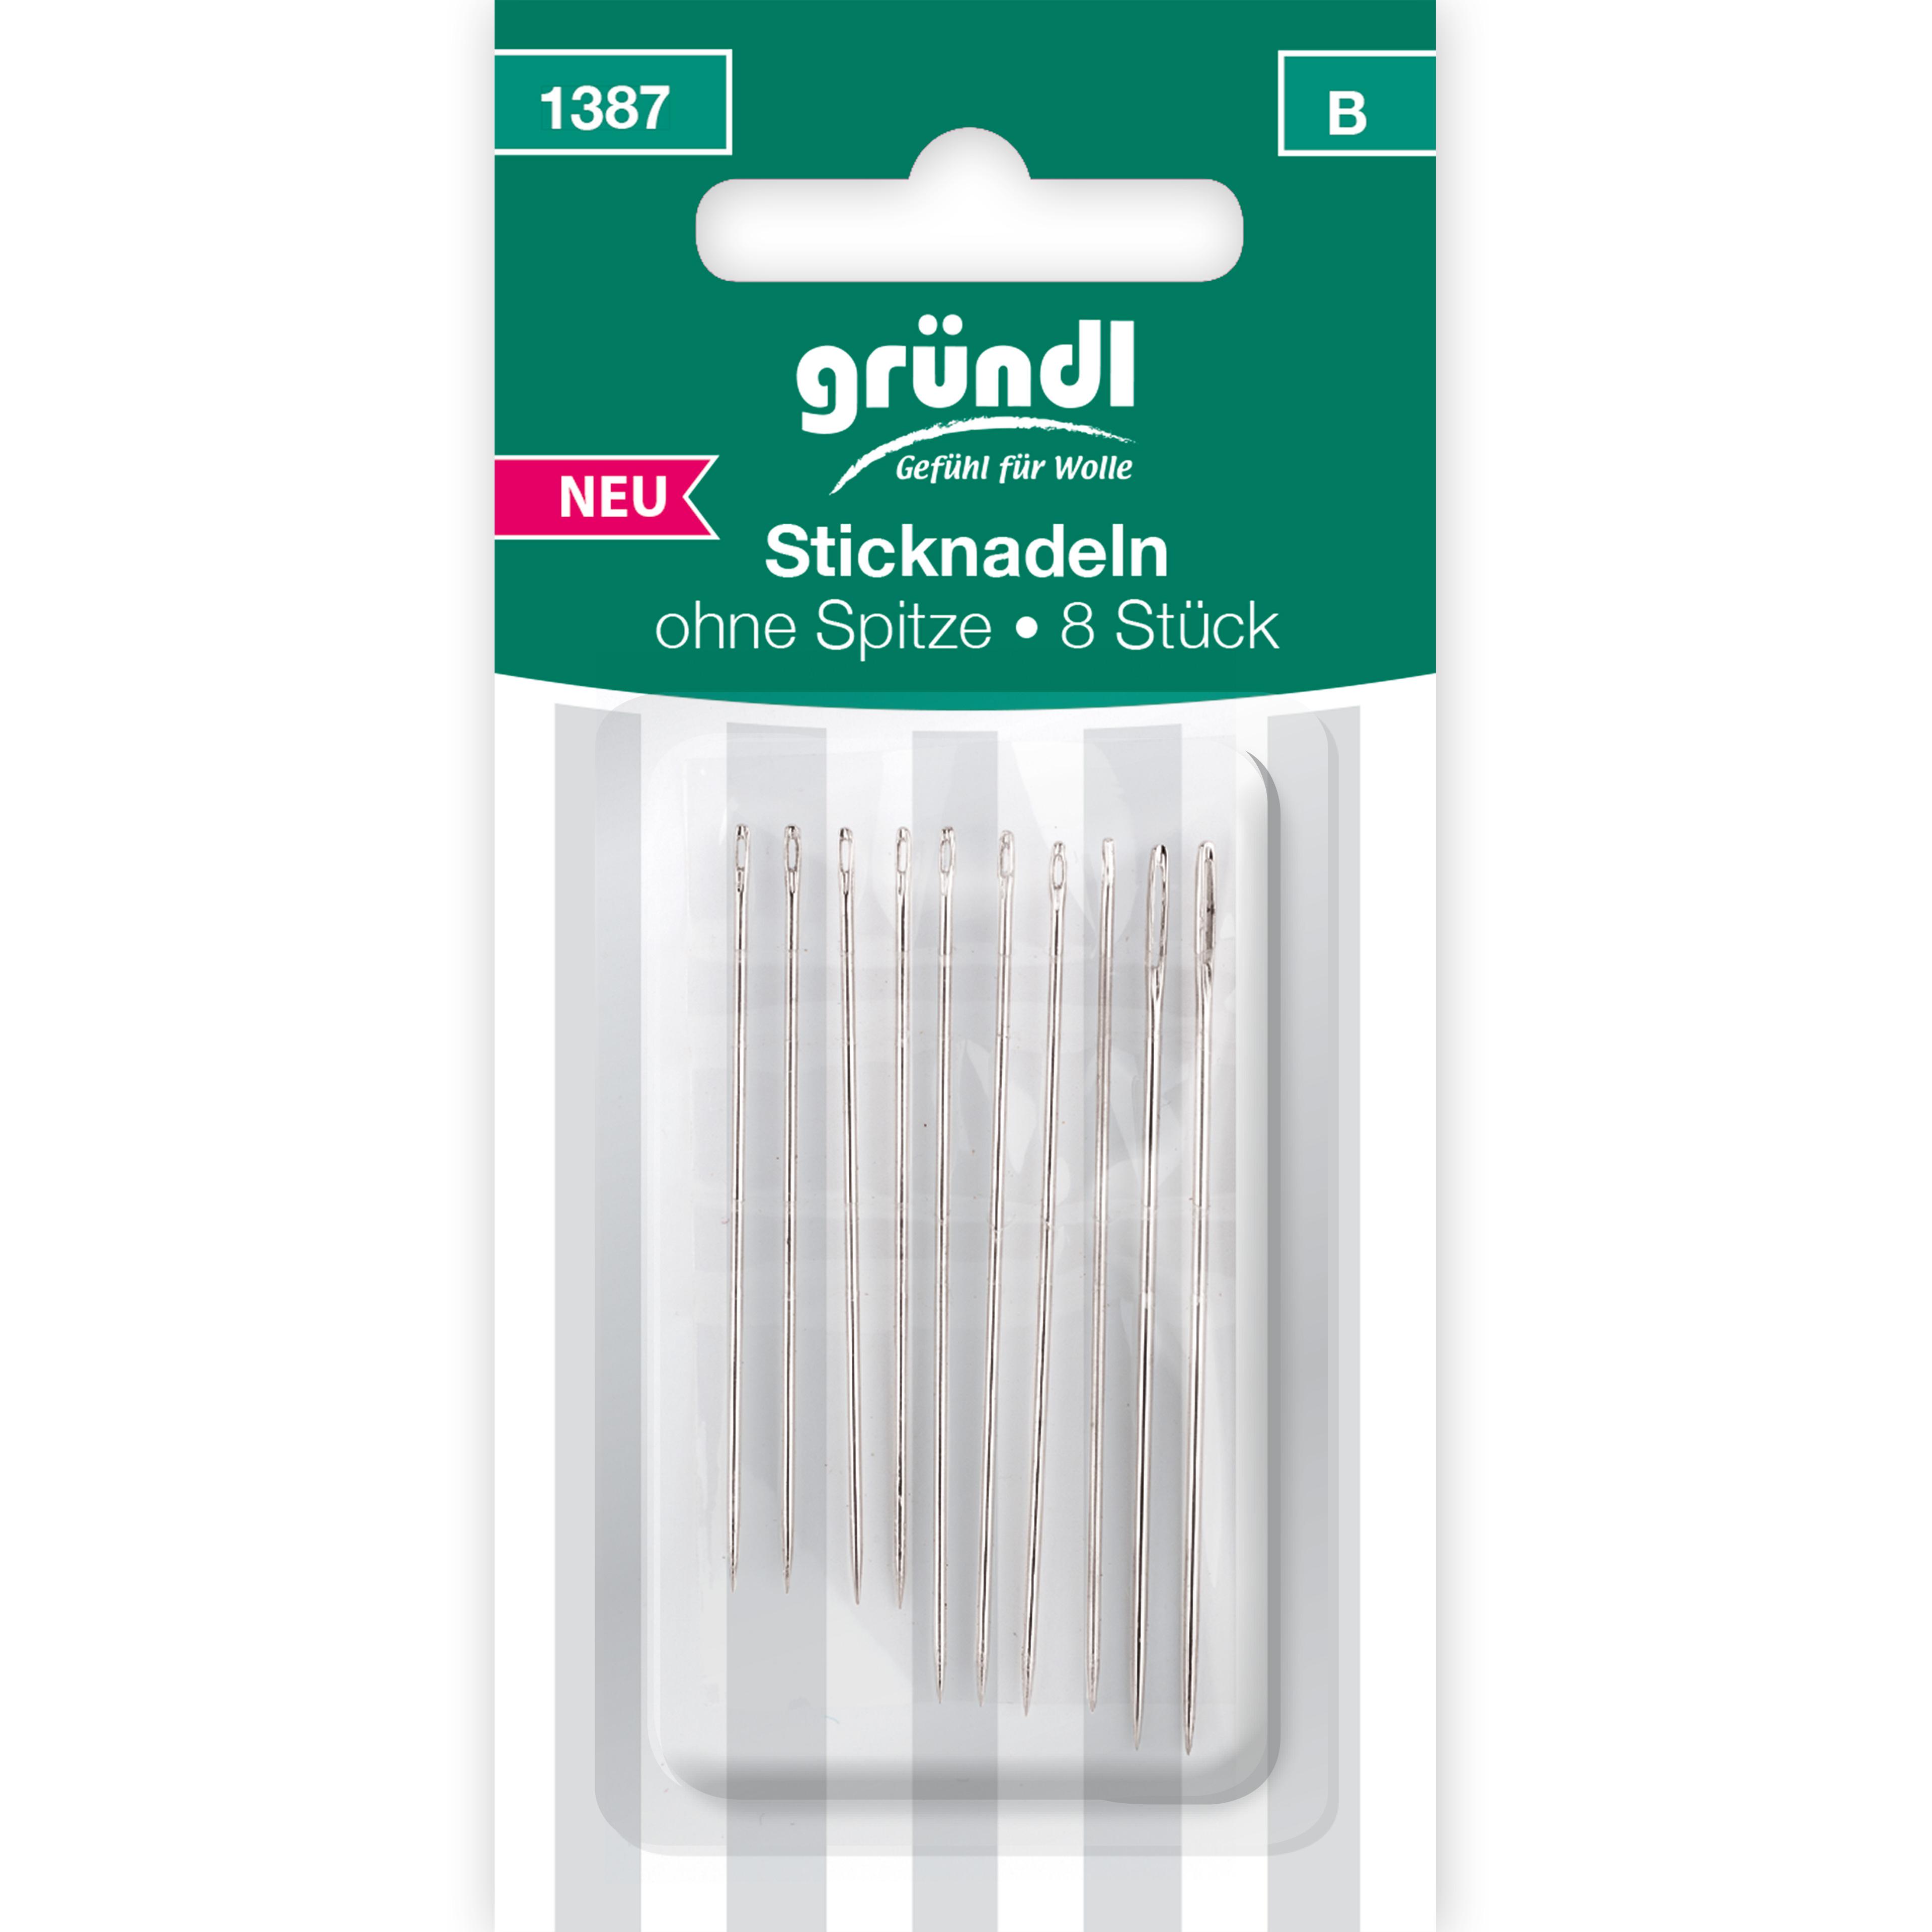 Sticknadeln ohne Spitze, 10 Nadeln, versch. Größen